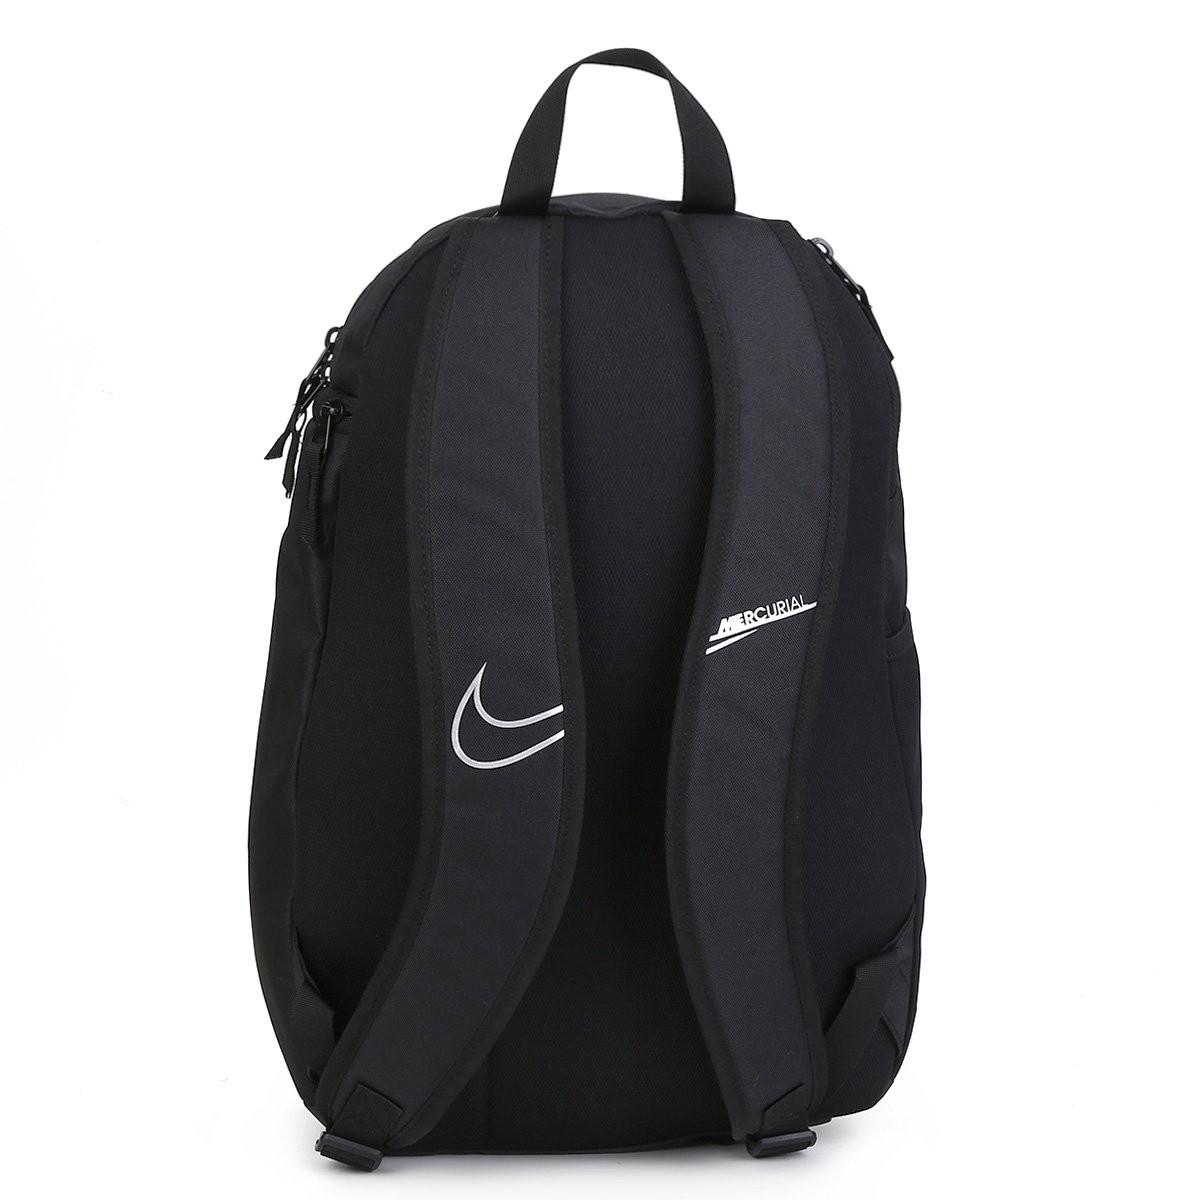 Mochila Nike Mercury Preto